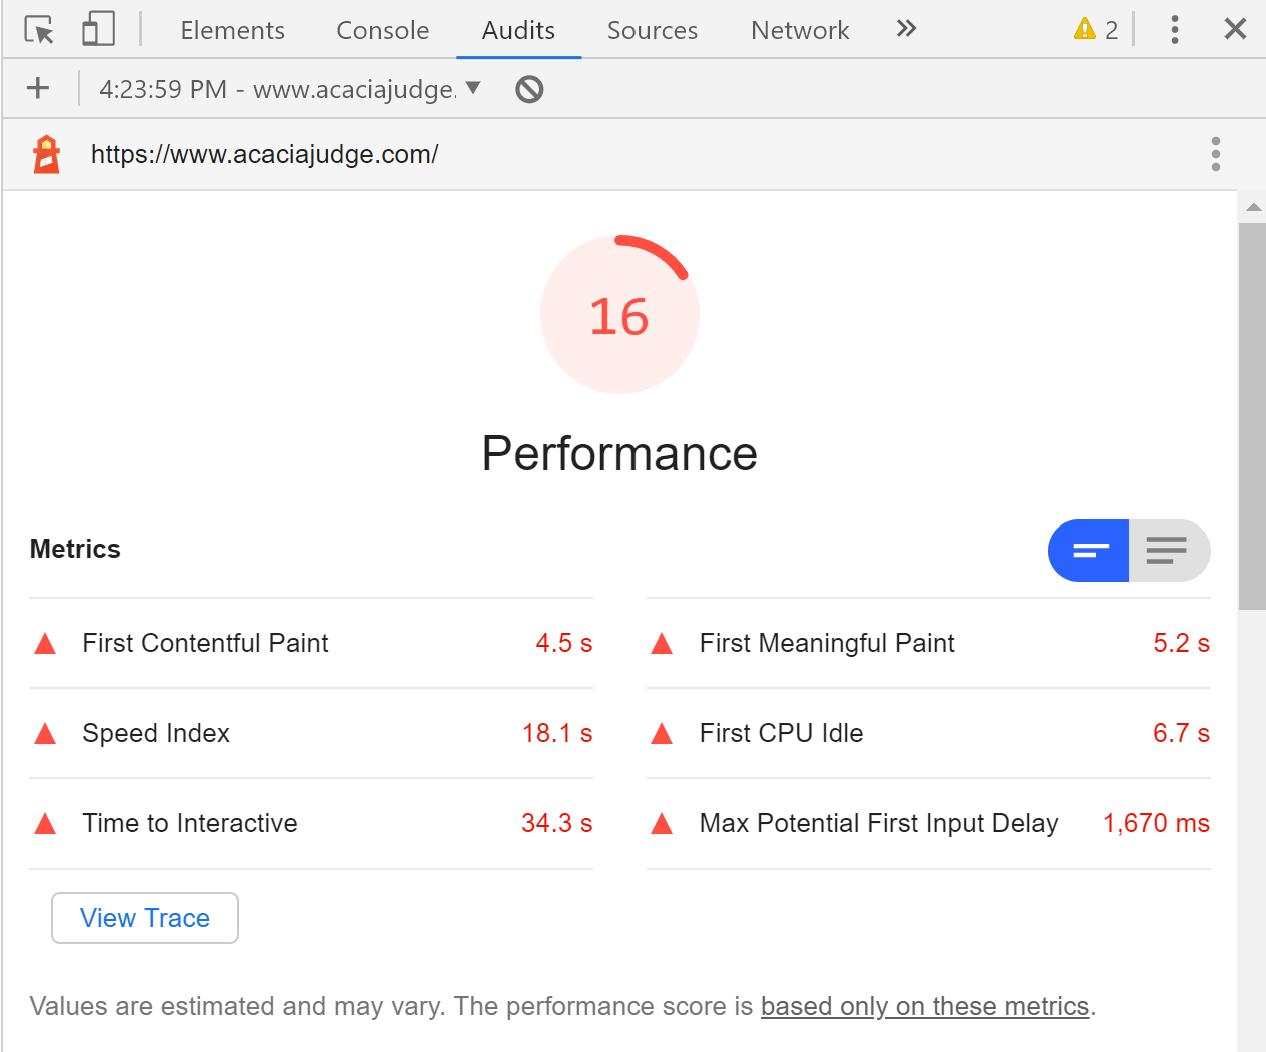 Lighthouse report for acaciajudge.com showing a performance score of 16